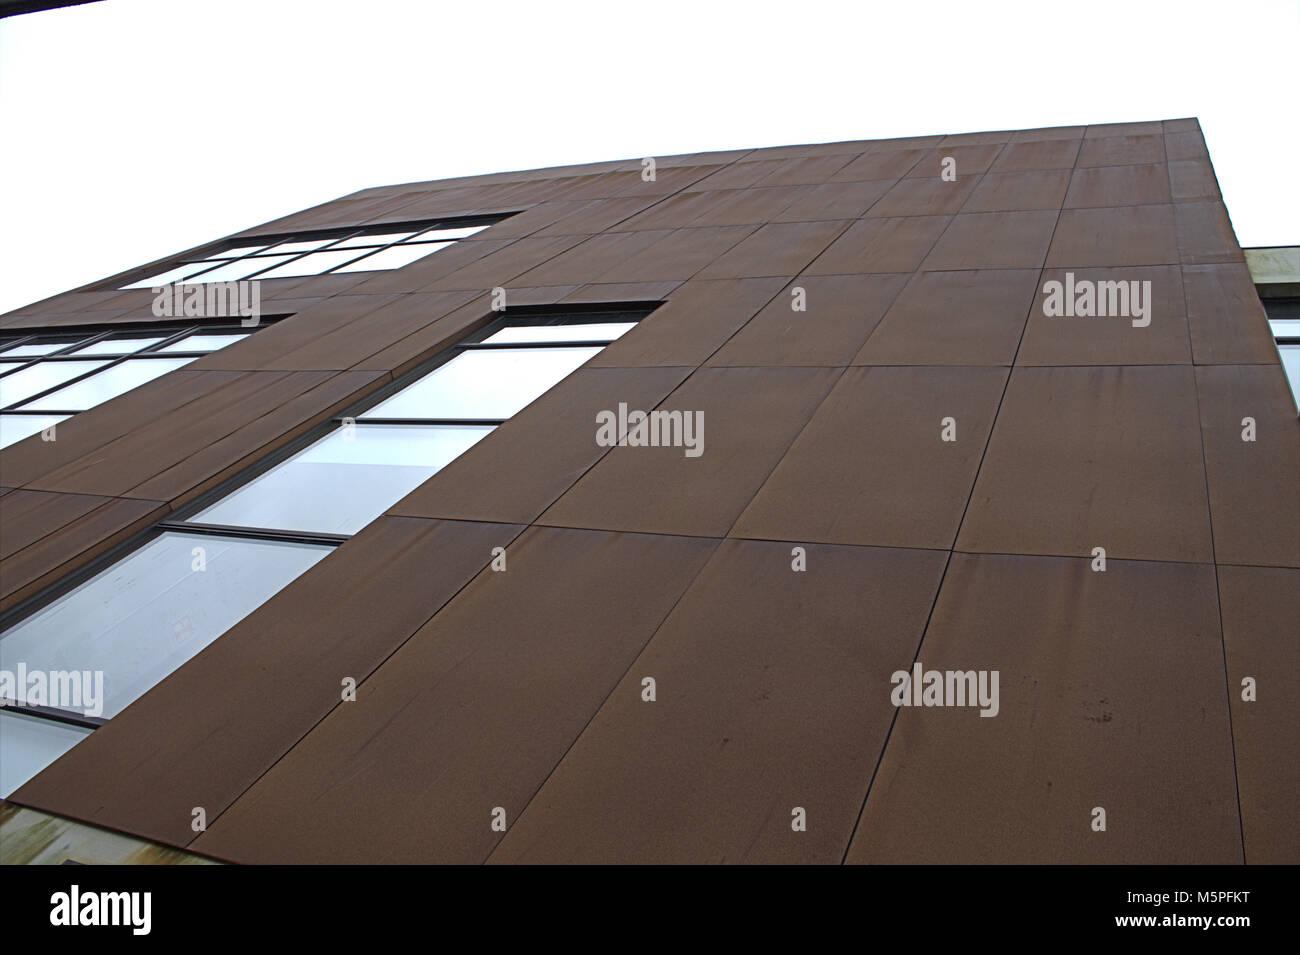 Sheet Metal Cladding Stock Photos Amp Sheet Metal Cladding